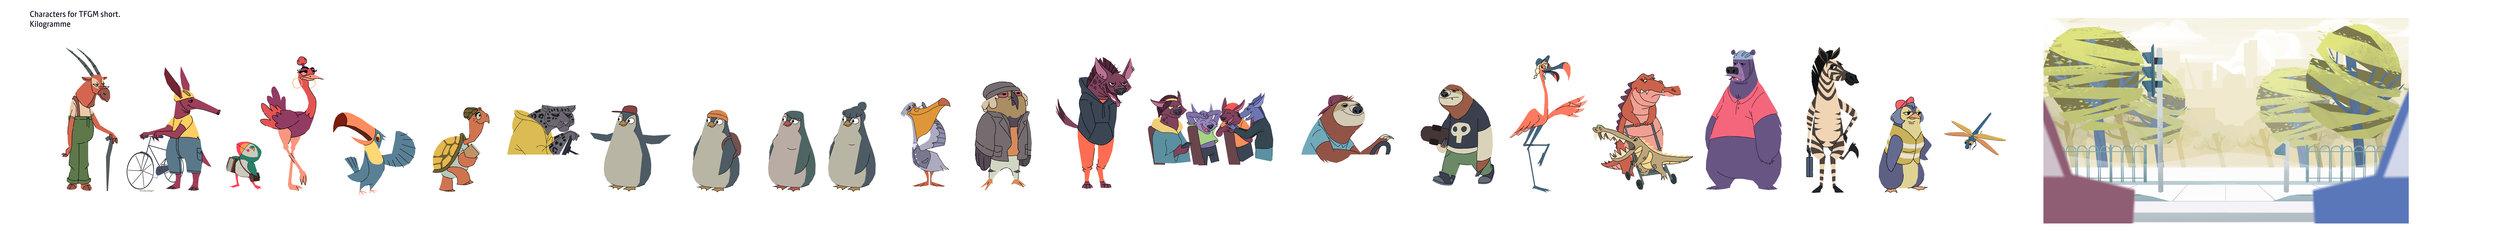 Character Lineup-v006.jpg